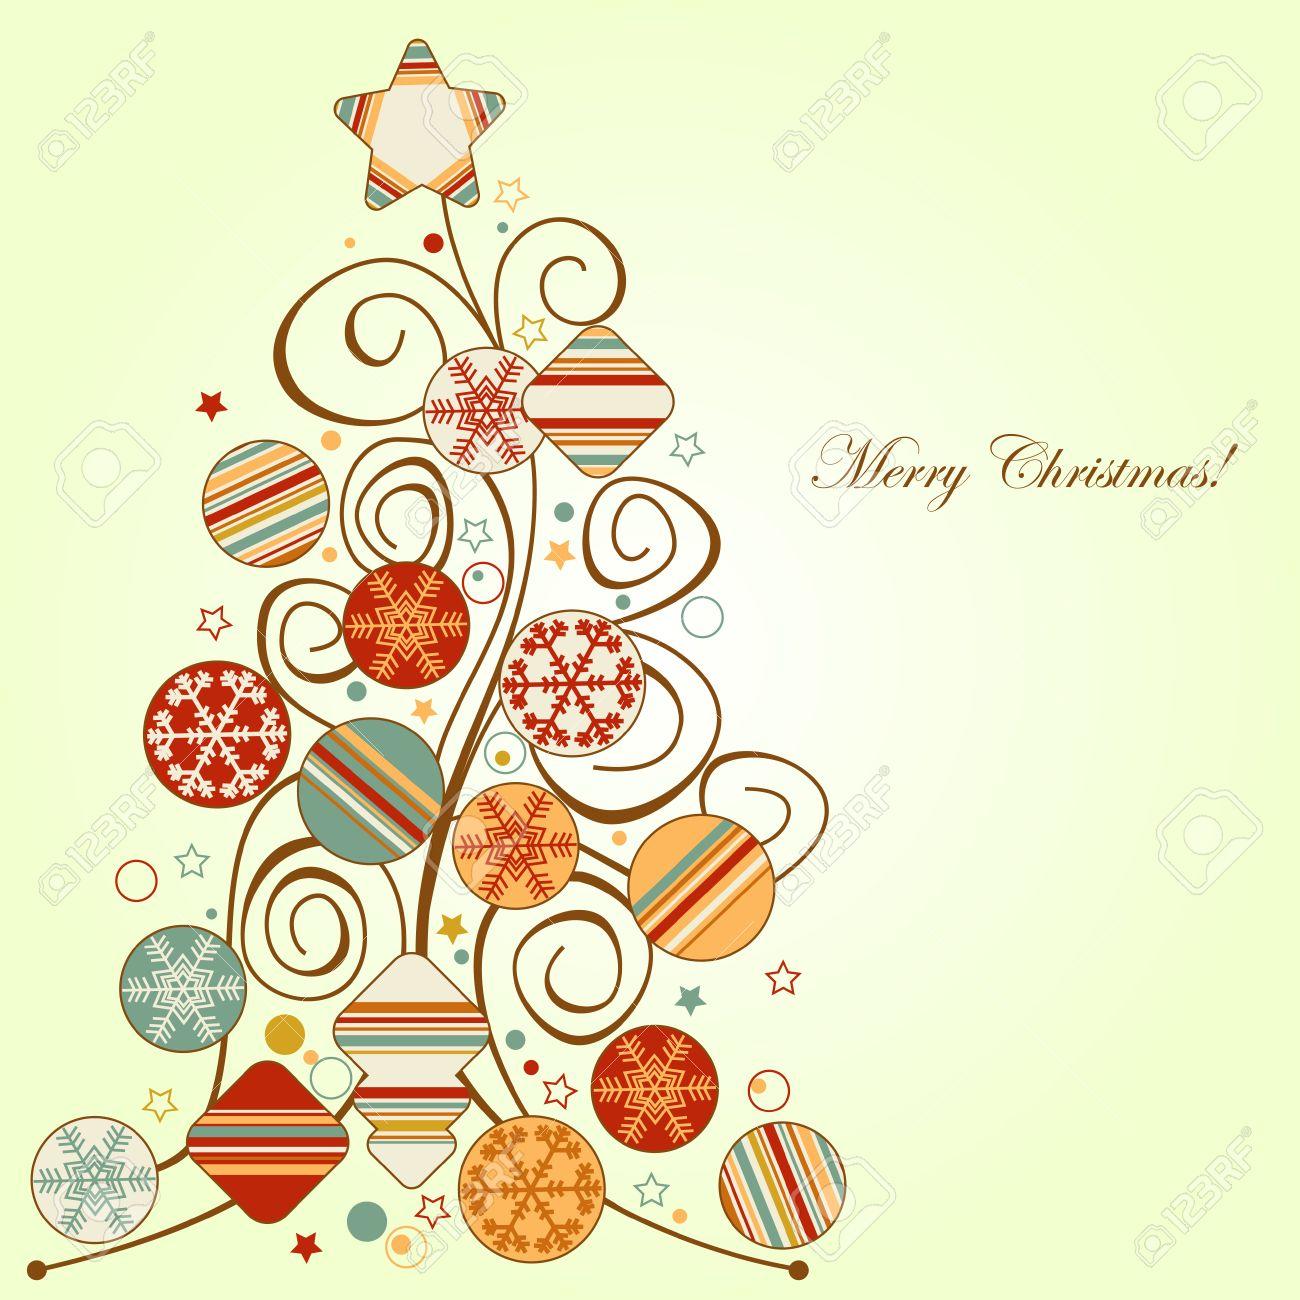 retro christmas tree stock vector 8132491 - Retro Christmas Trees